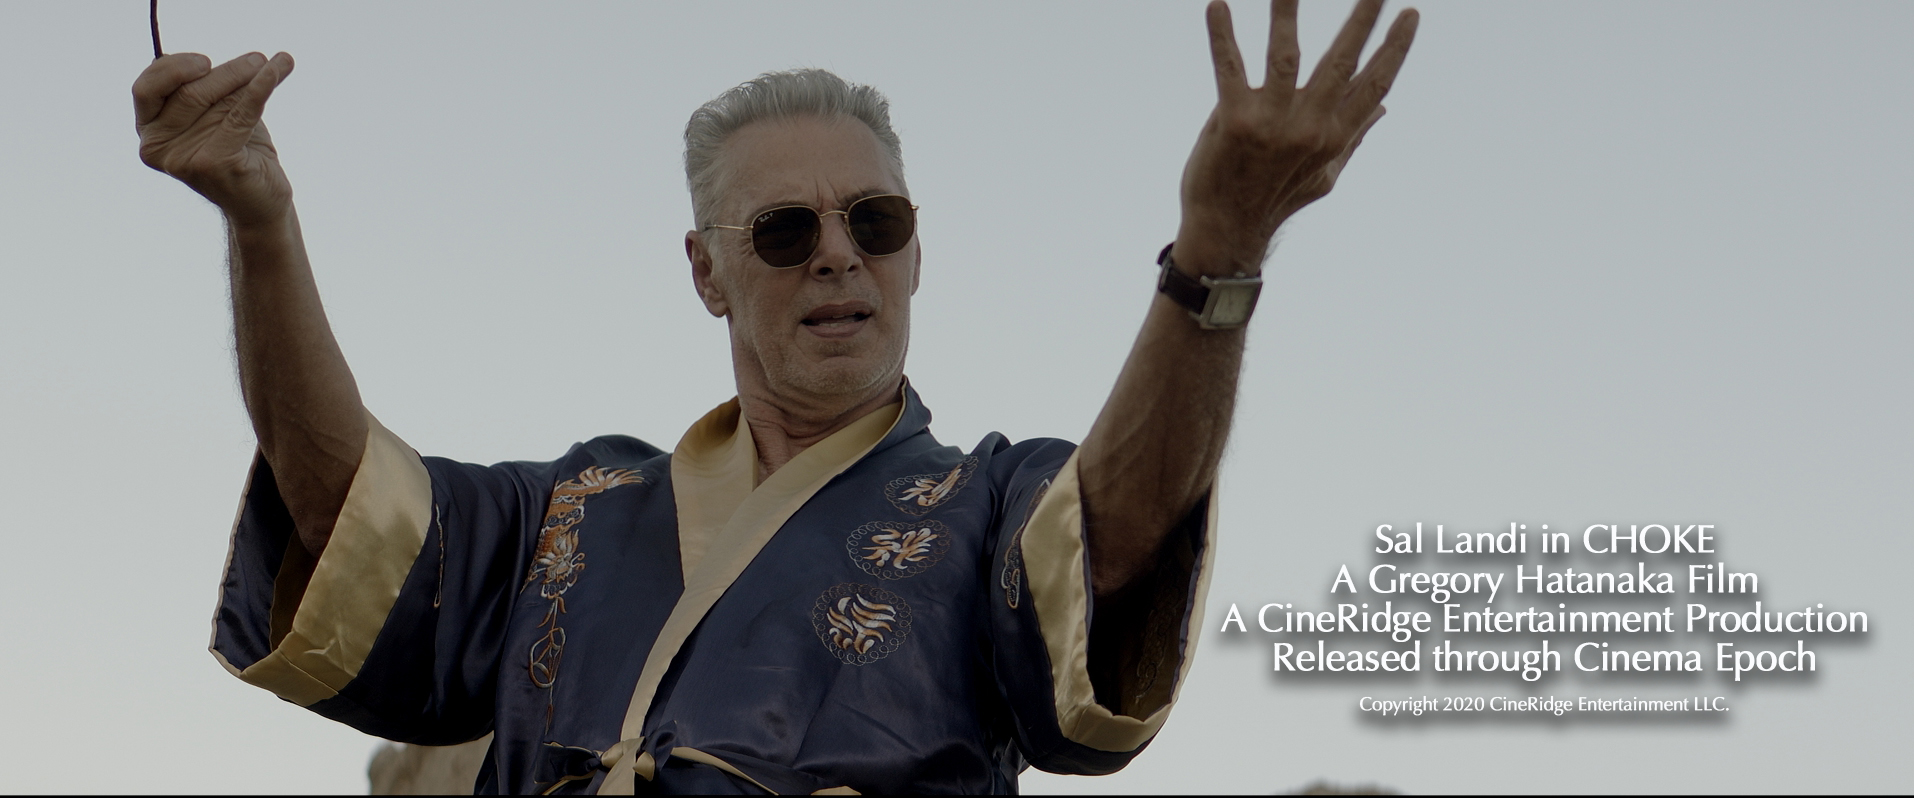 Sal Landi in Choke (2020)